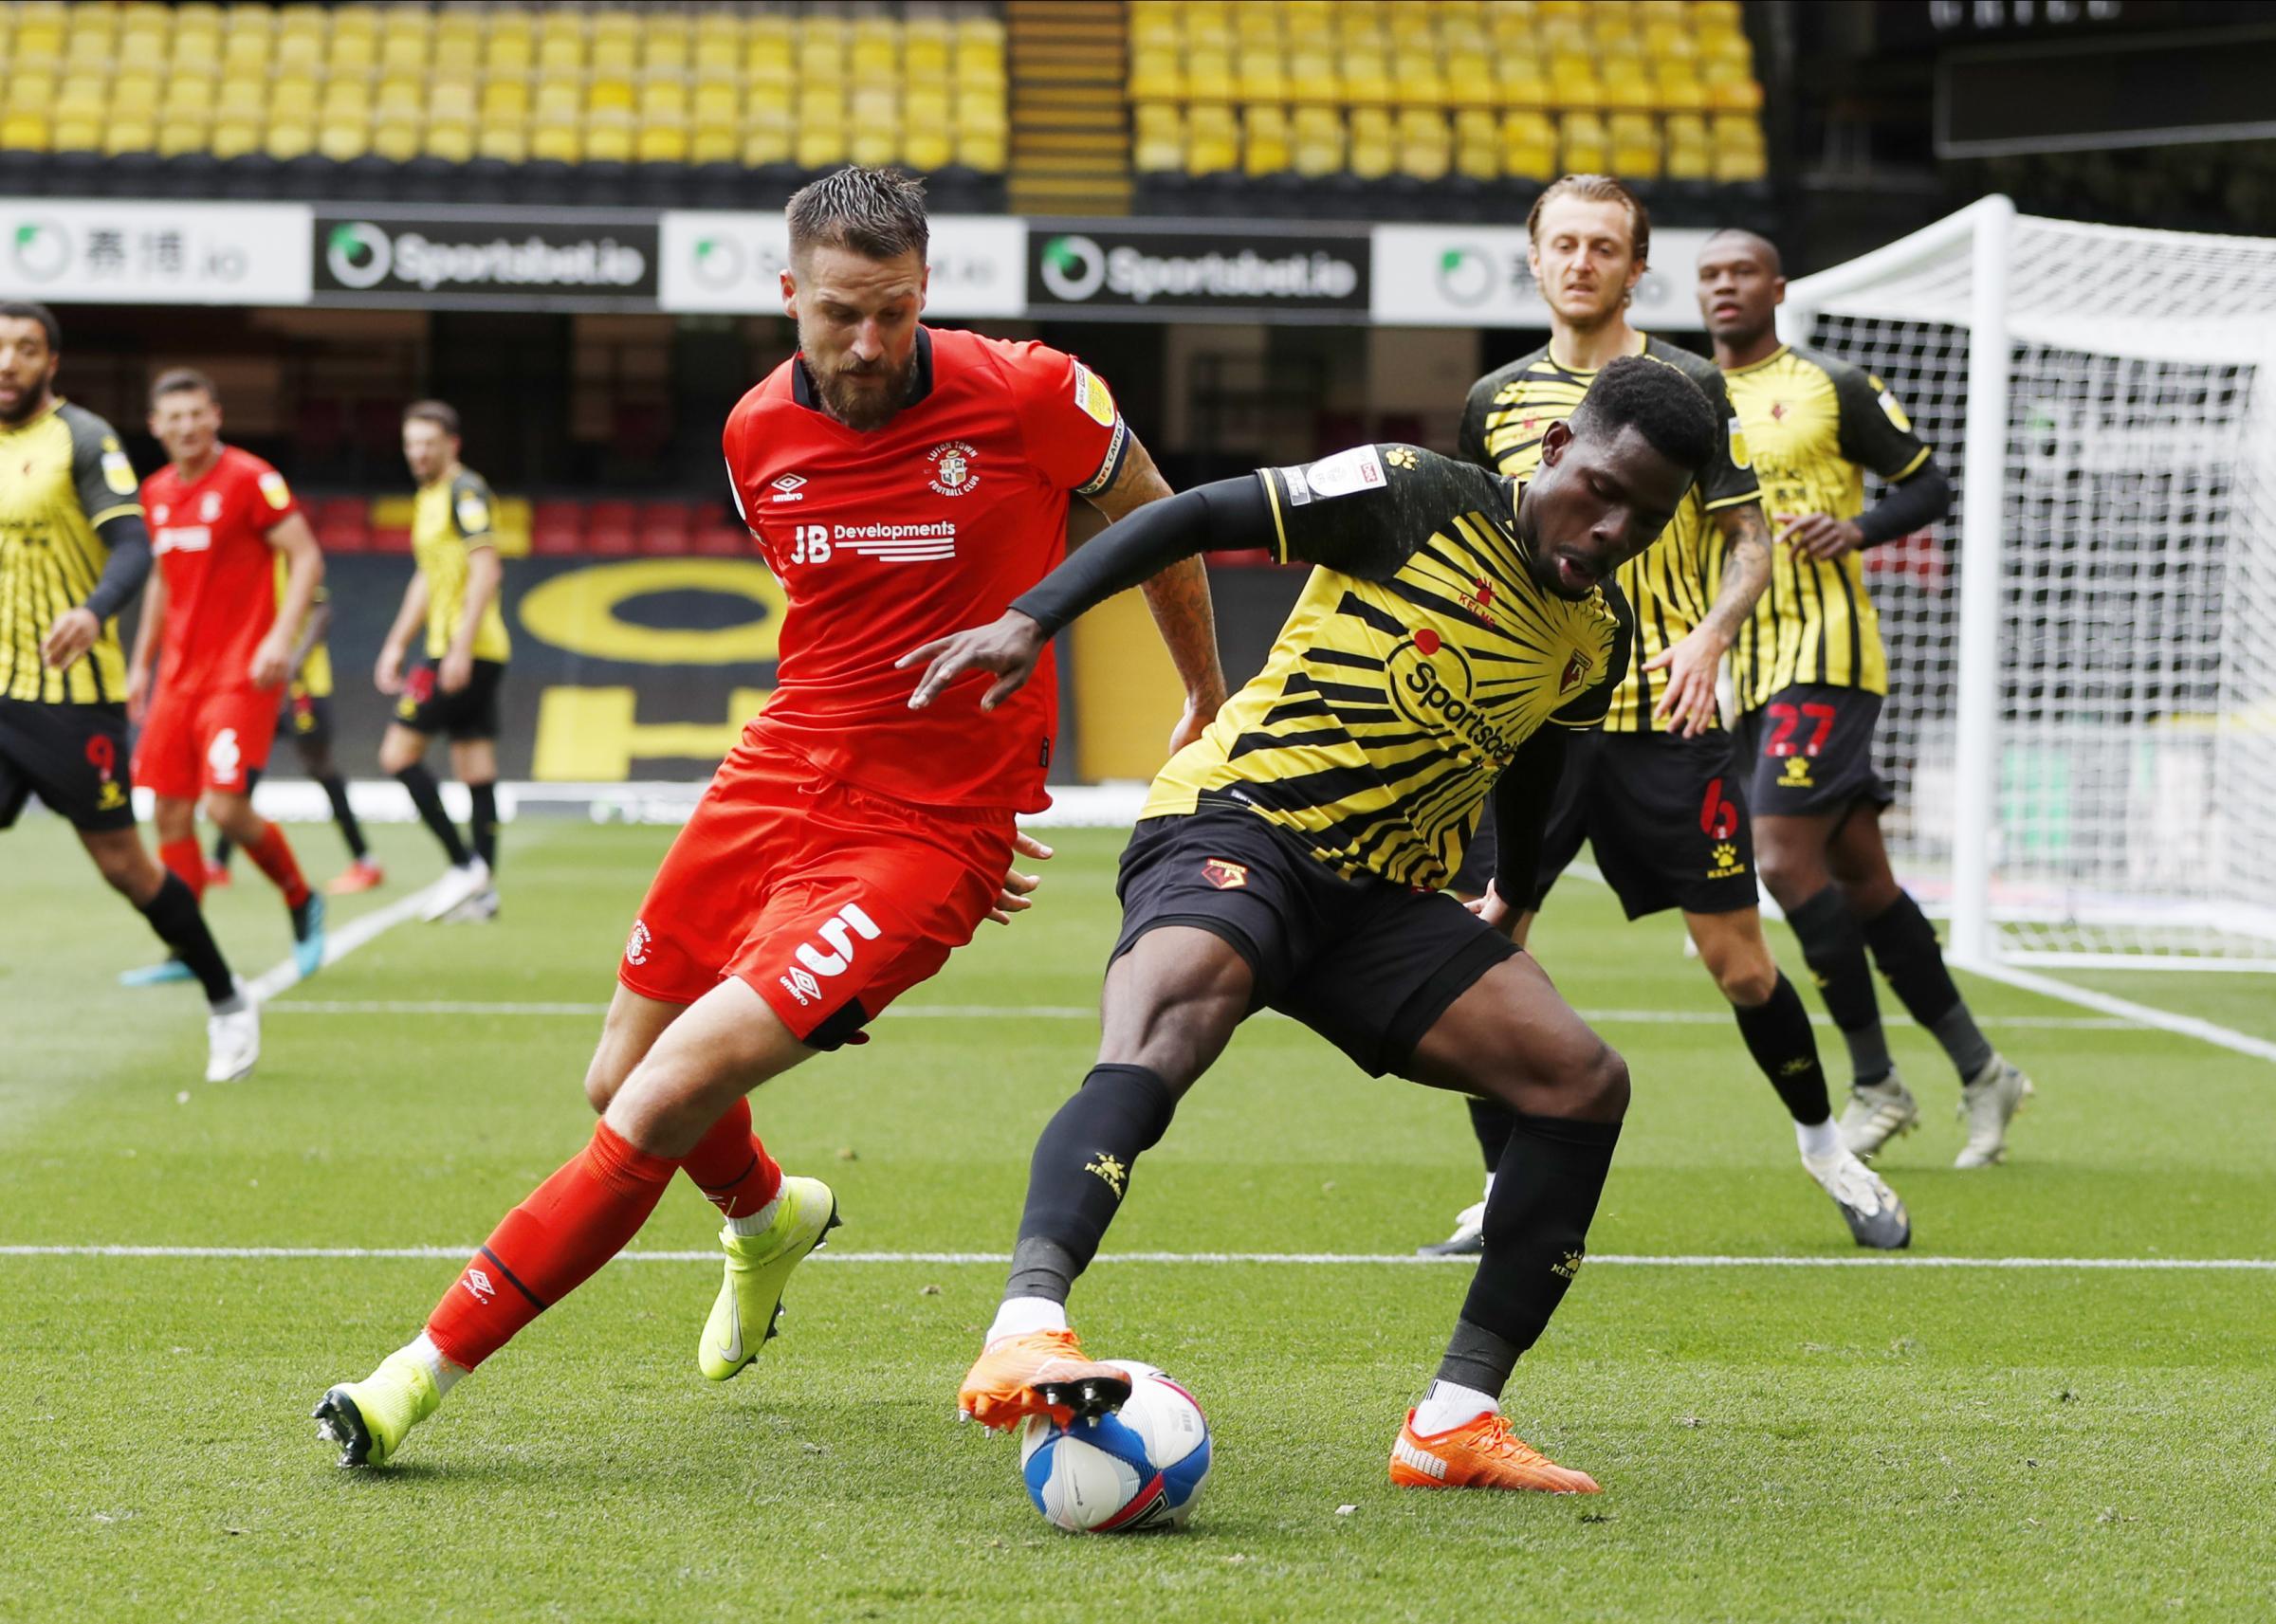 Watford's Tom Dele-Bashiru set for Reading loan